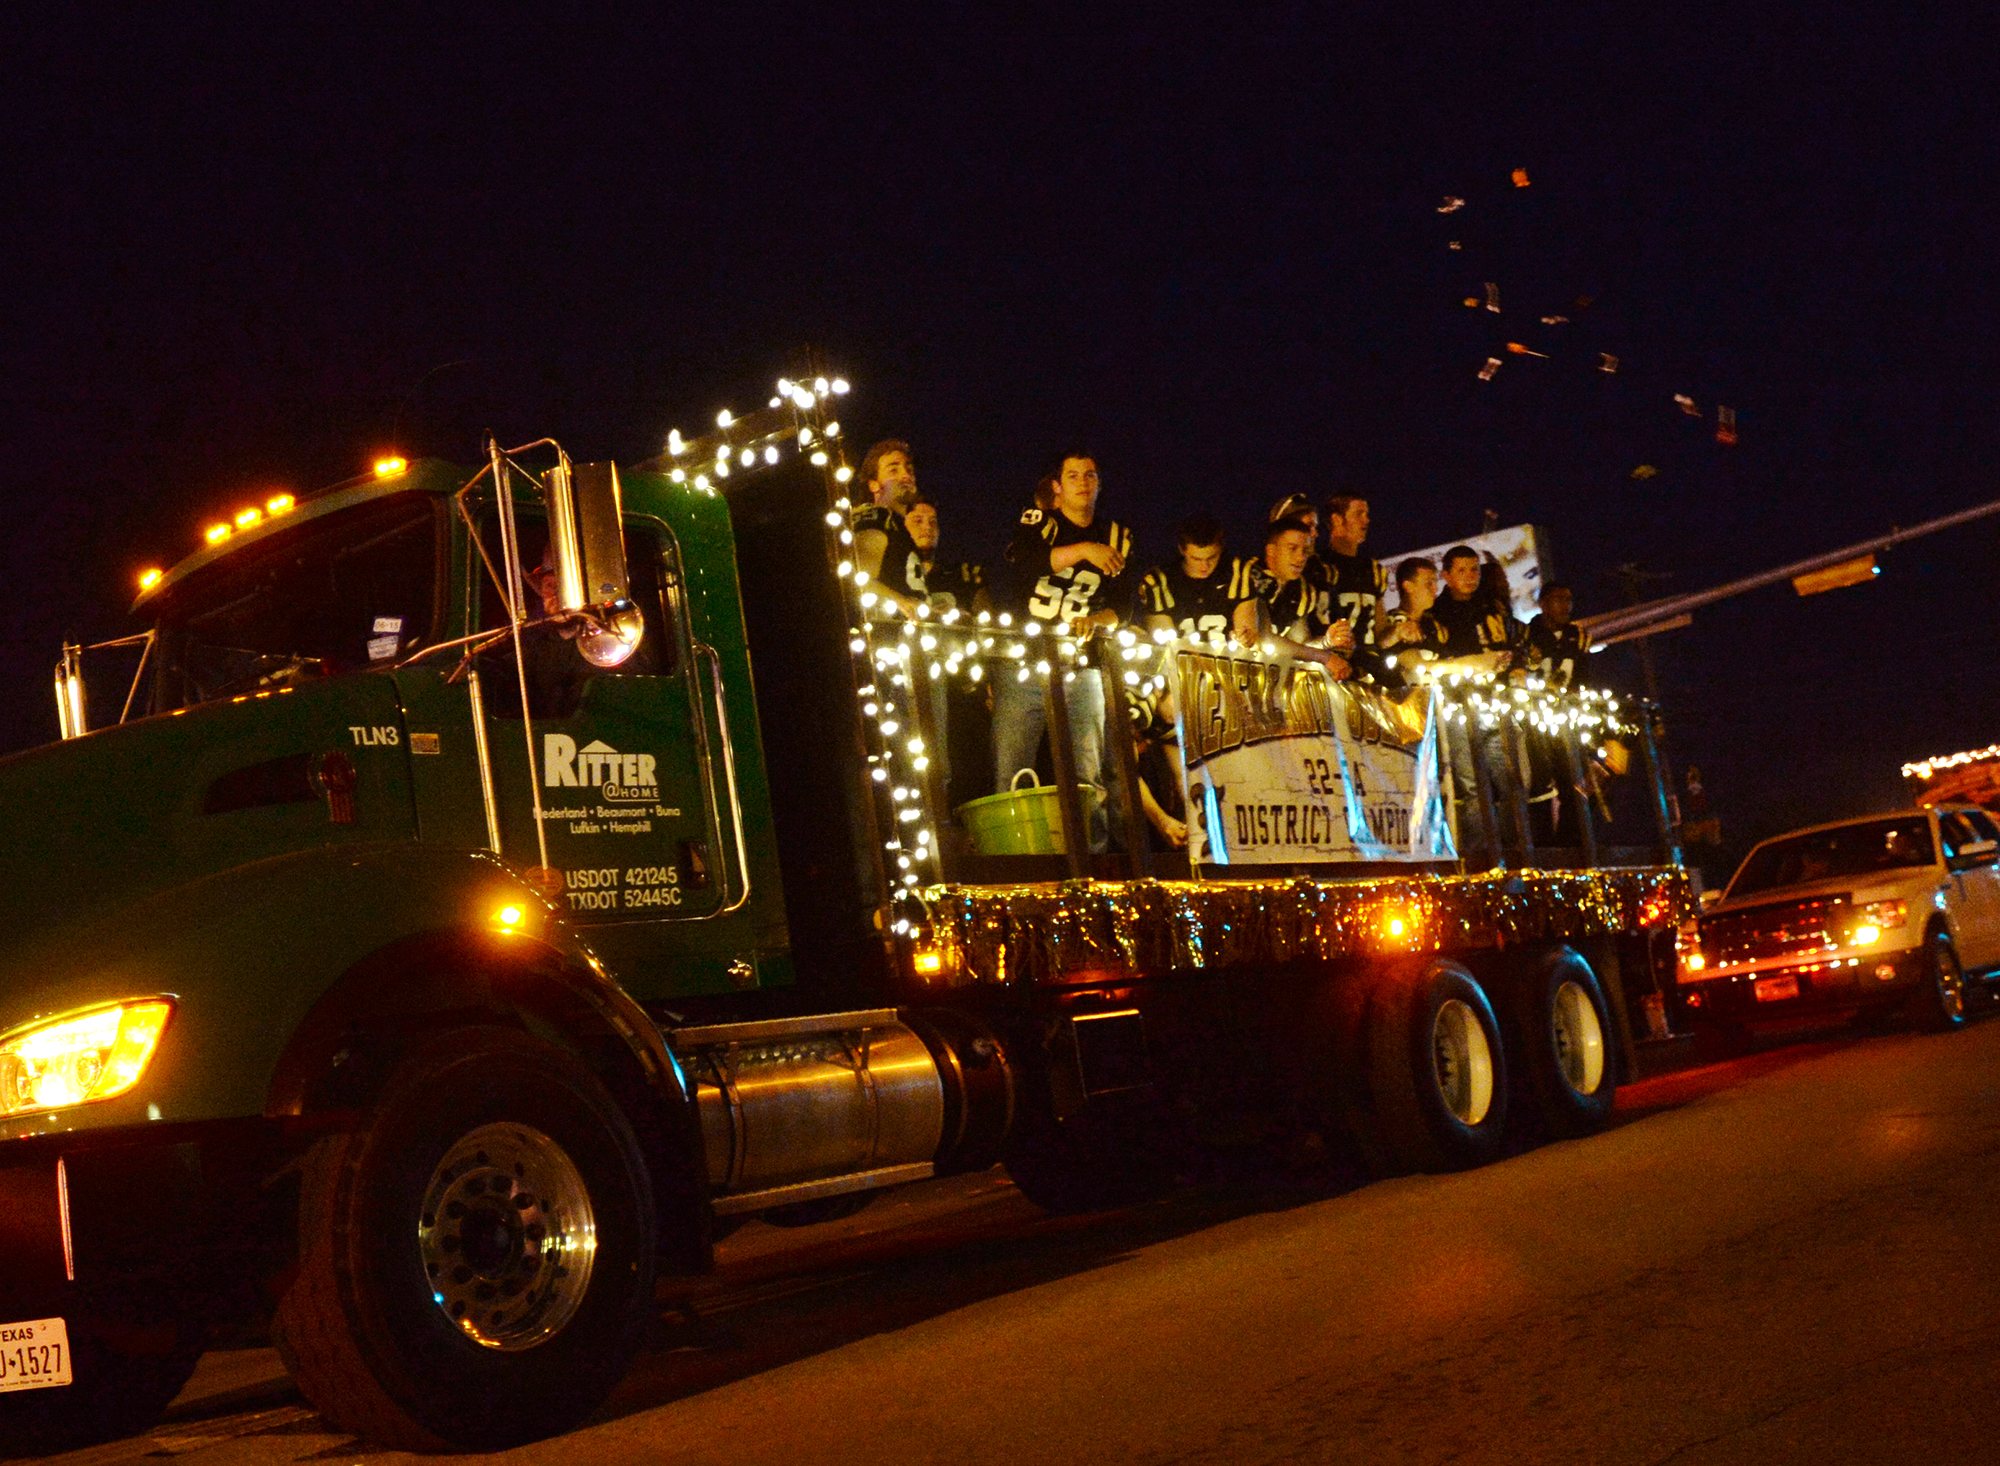 Nederland Christmas Parade 2020 Nederland Texas Christmas Parade 2020 | Fbhuyk.newyearhouse.site